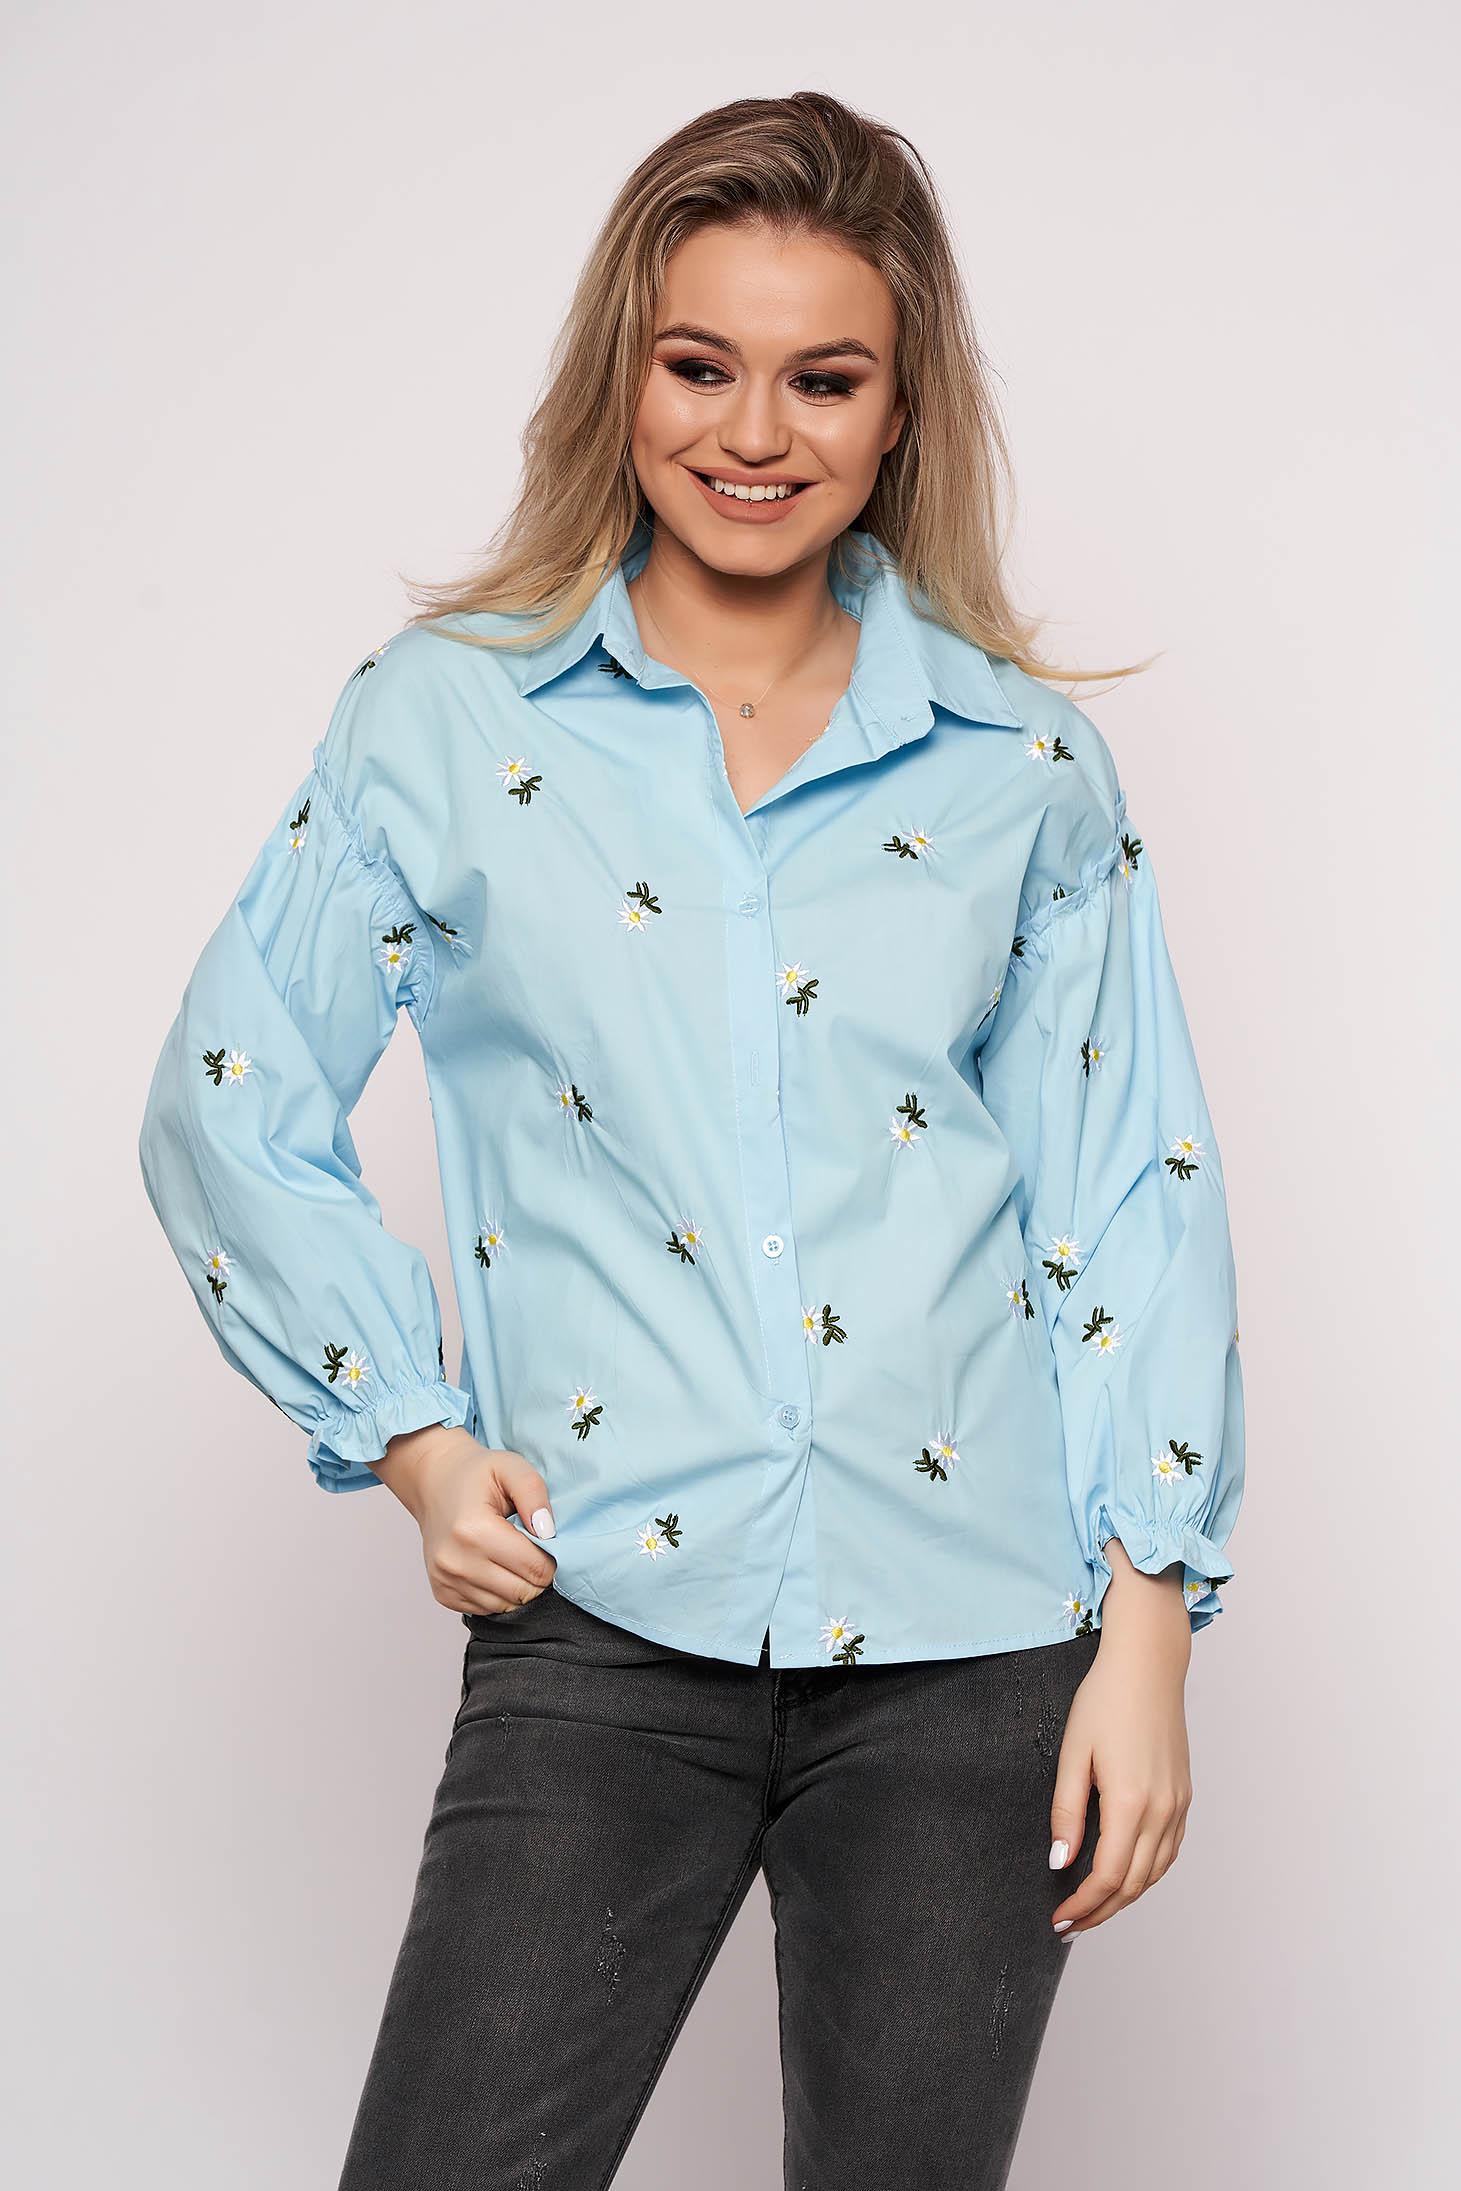 Camasa dama SunShine albastra casual scurta din bumbac cu croi larg cu imprimeu floral